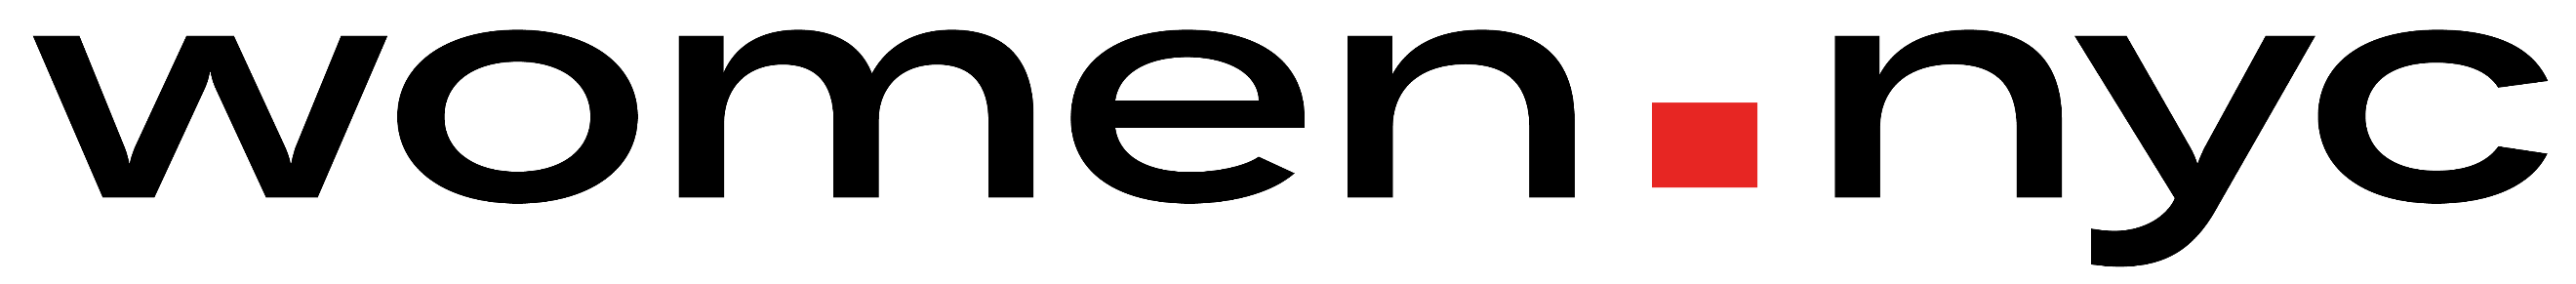 women.nyc logo